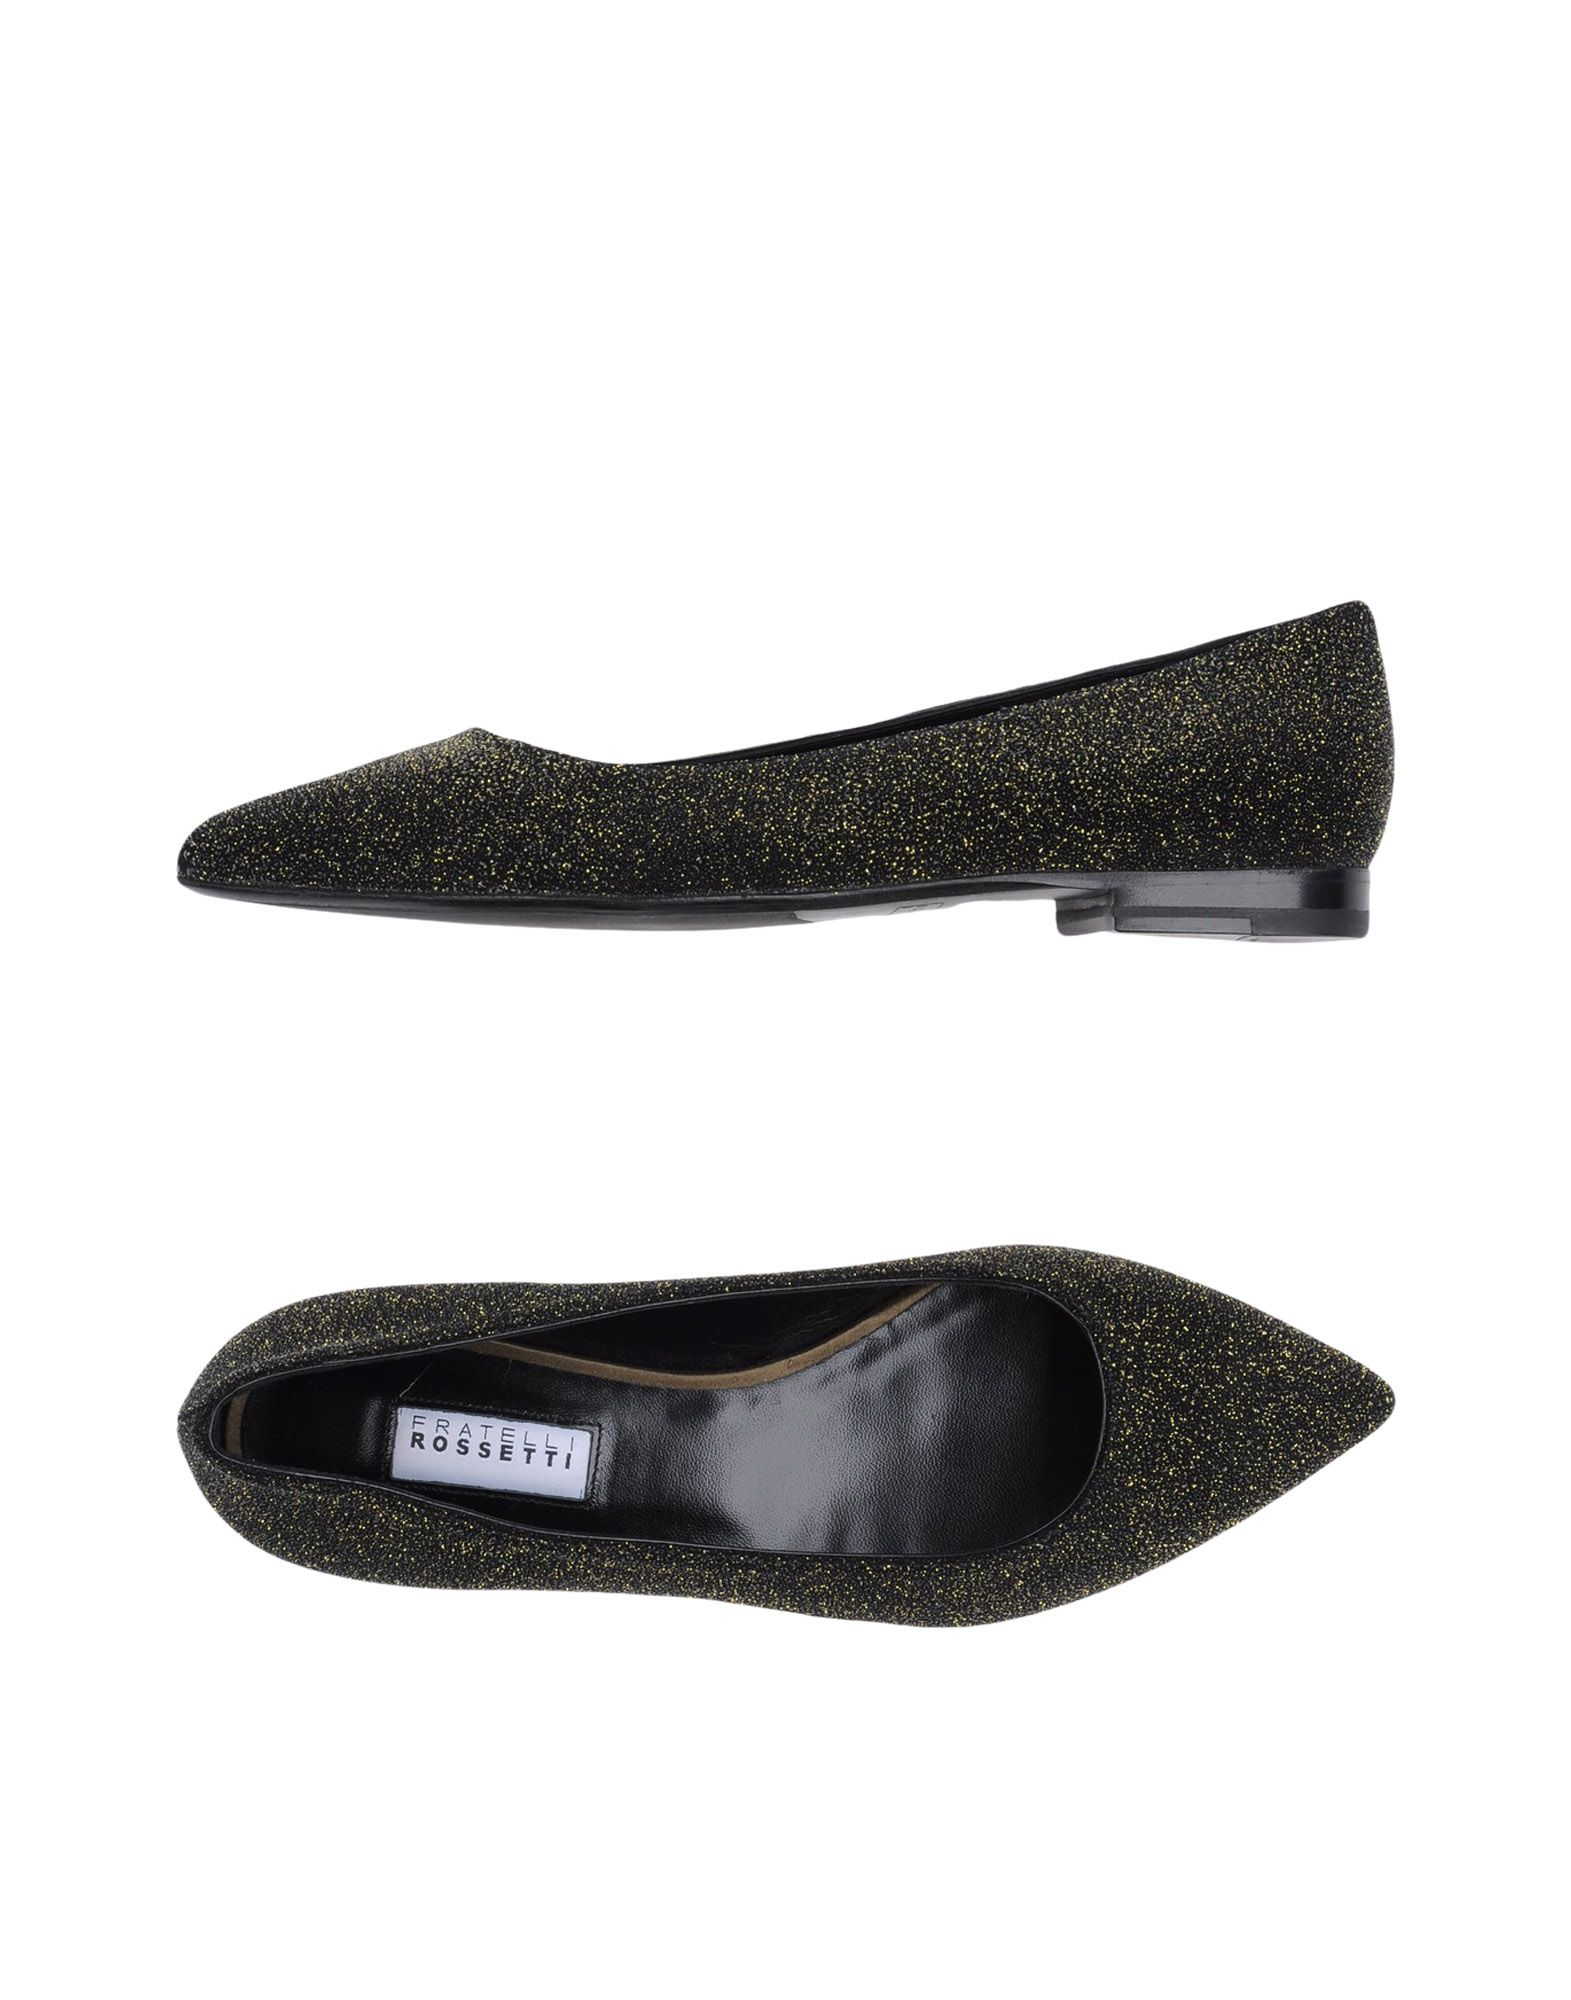 Stilvolle billige Schuhe Fratelli Rossetti Ballerinas Damen  11332531GE 11332531GE 11332531GE 397973